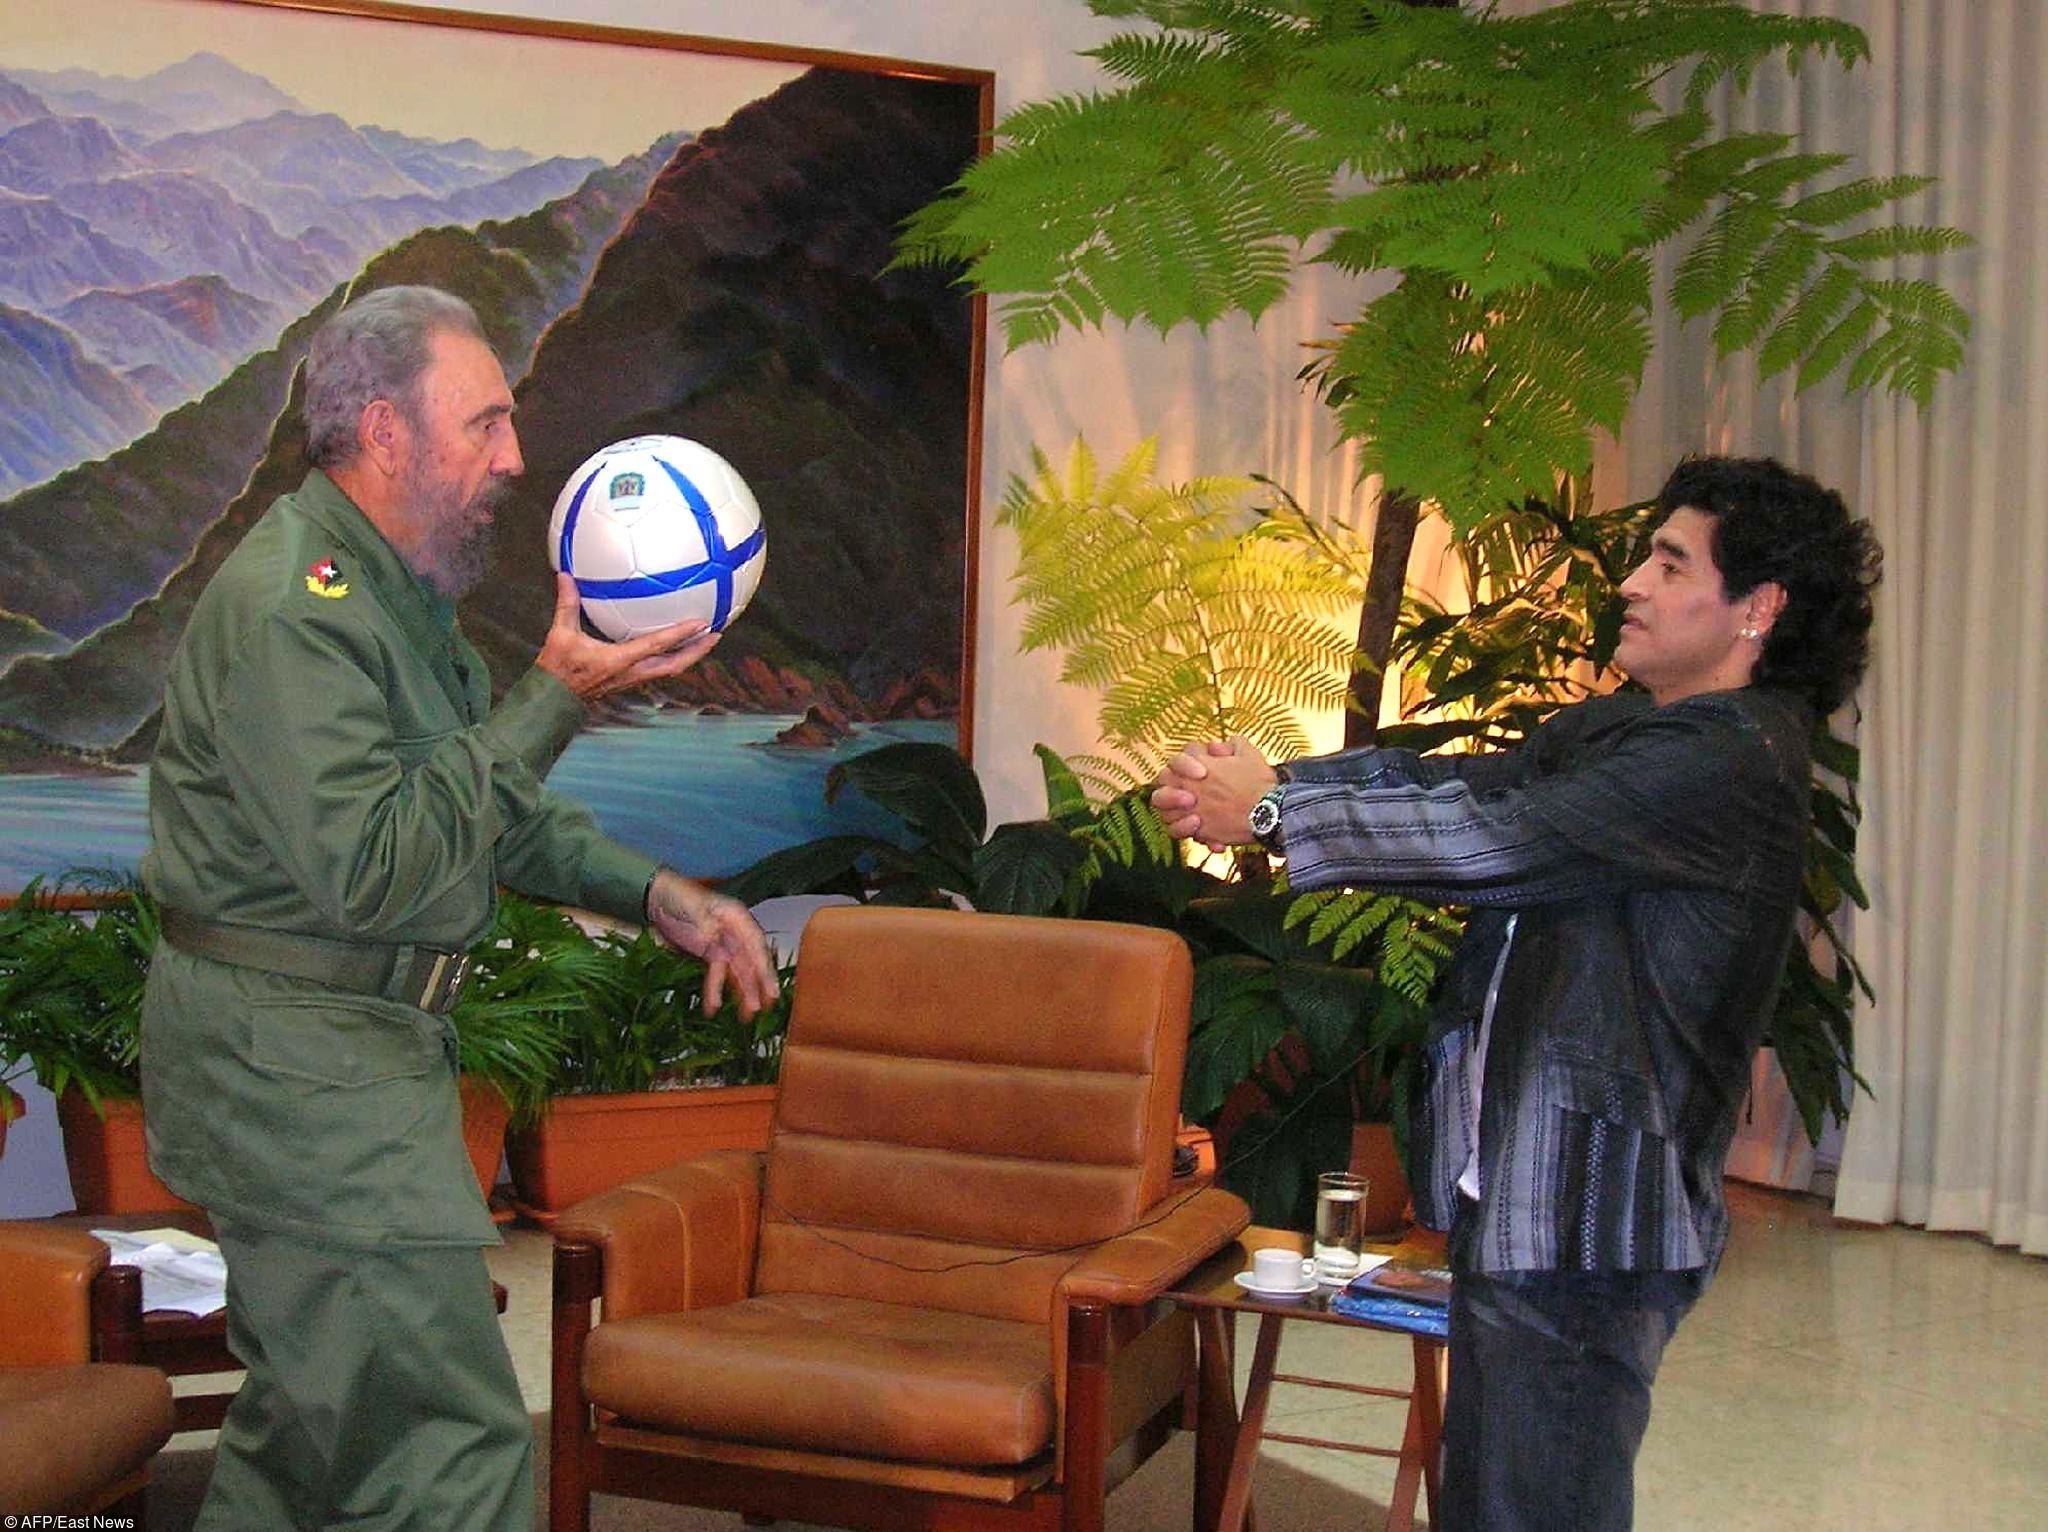 Трамп: Фиделя Кастро был жестоким диктатором